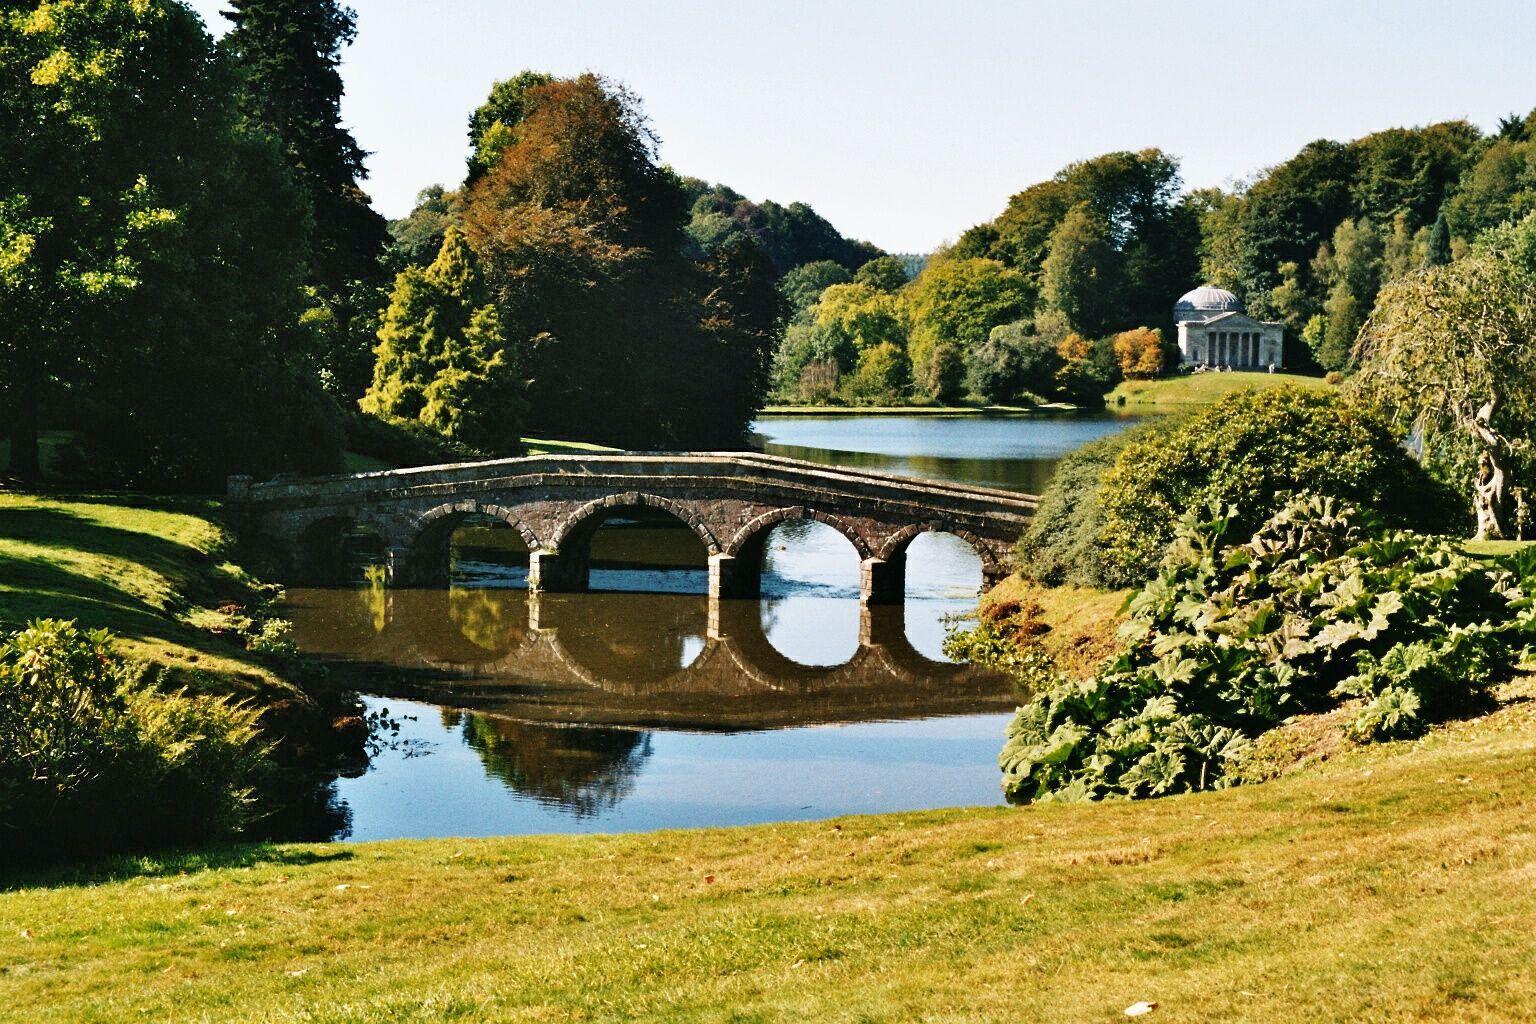 Most beautiful english gardens - Stourhead Description English Stourhead Garden Picture Of One Of The Most Beautiful Gardens